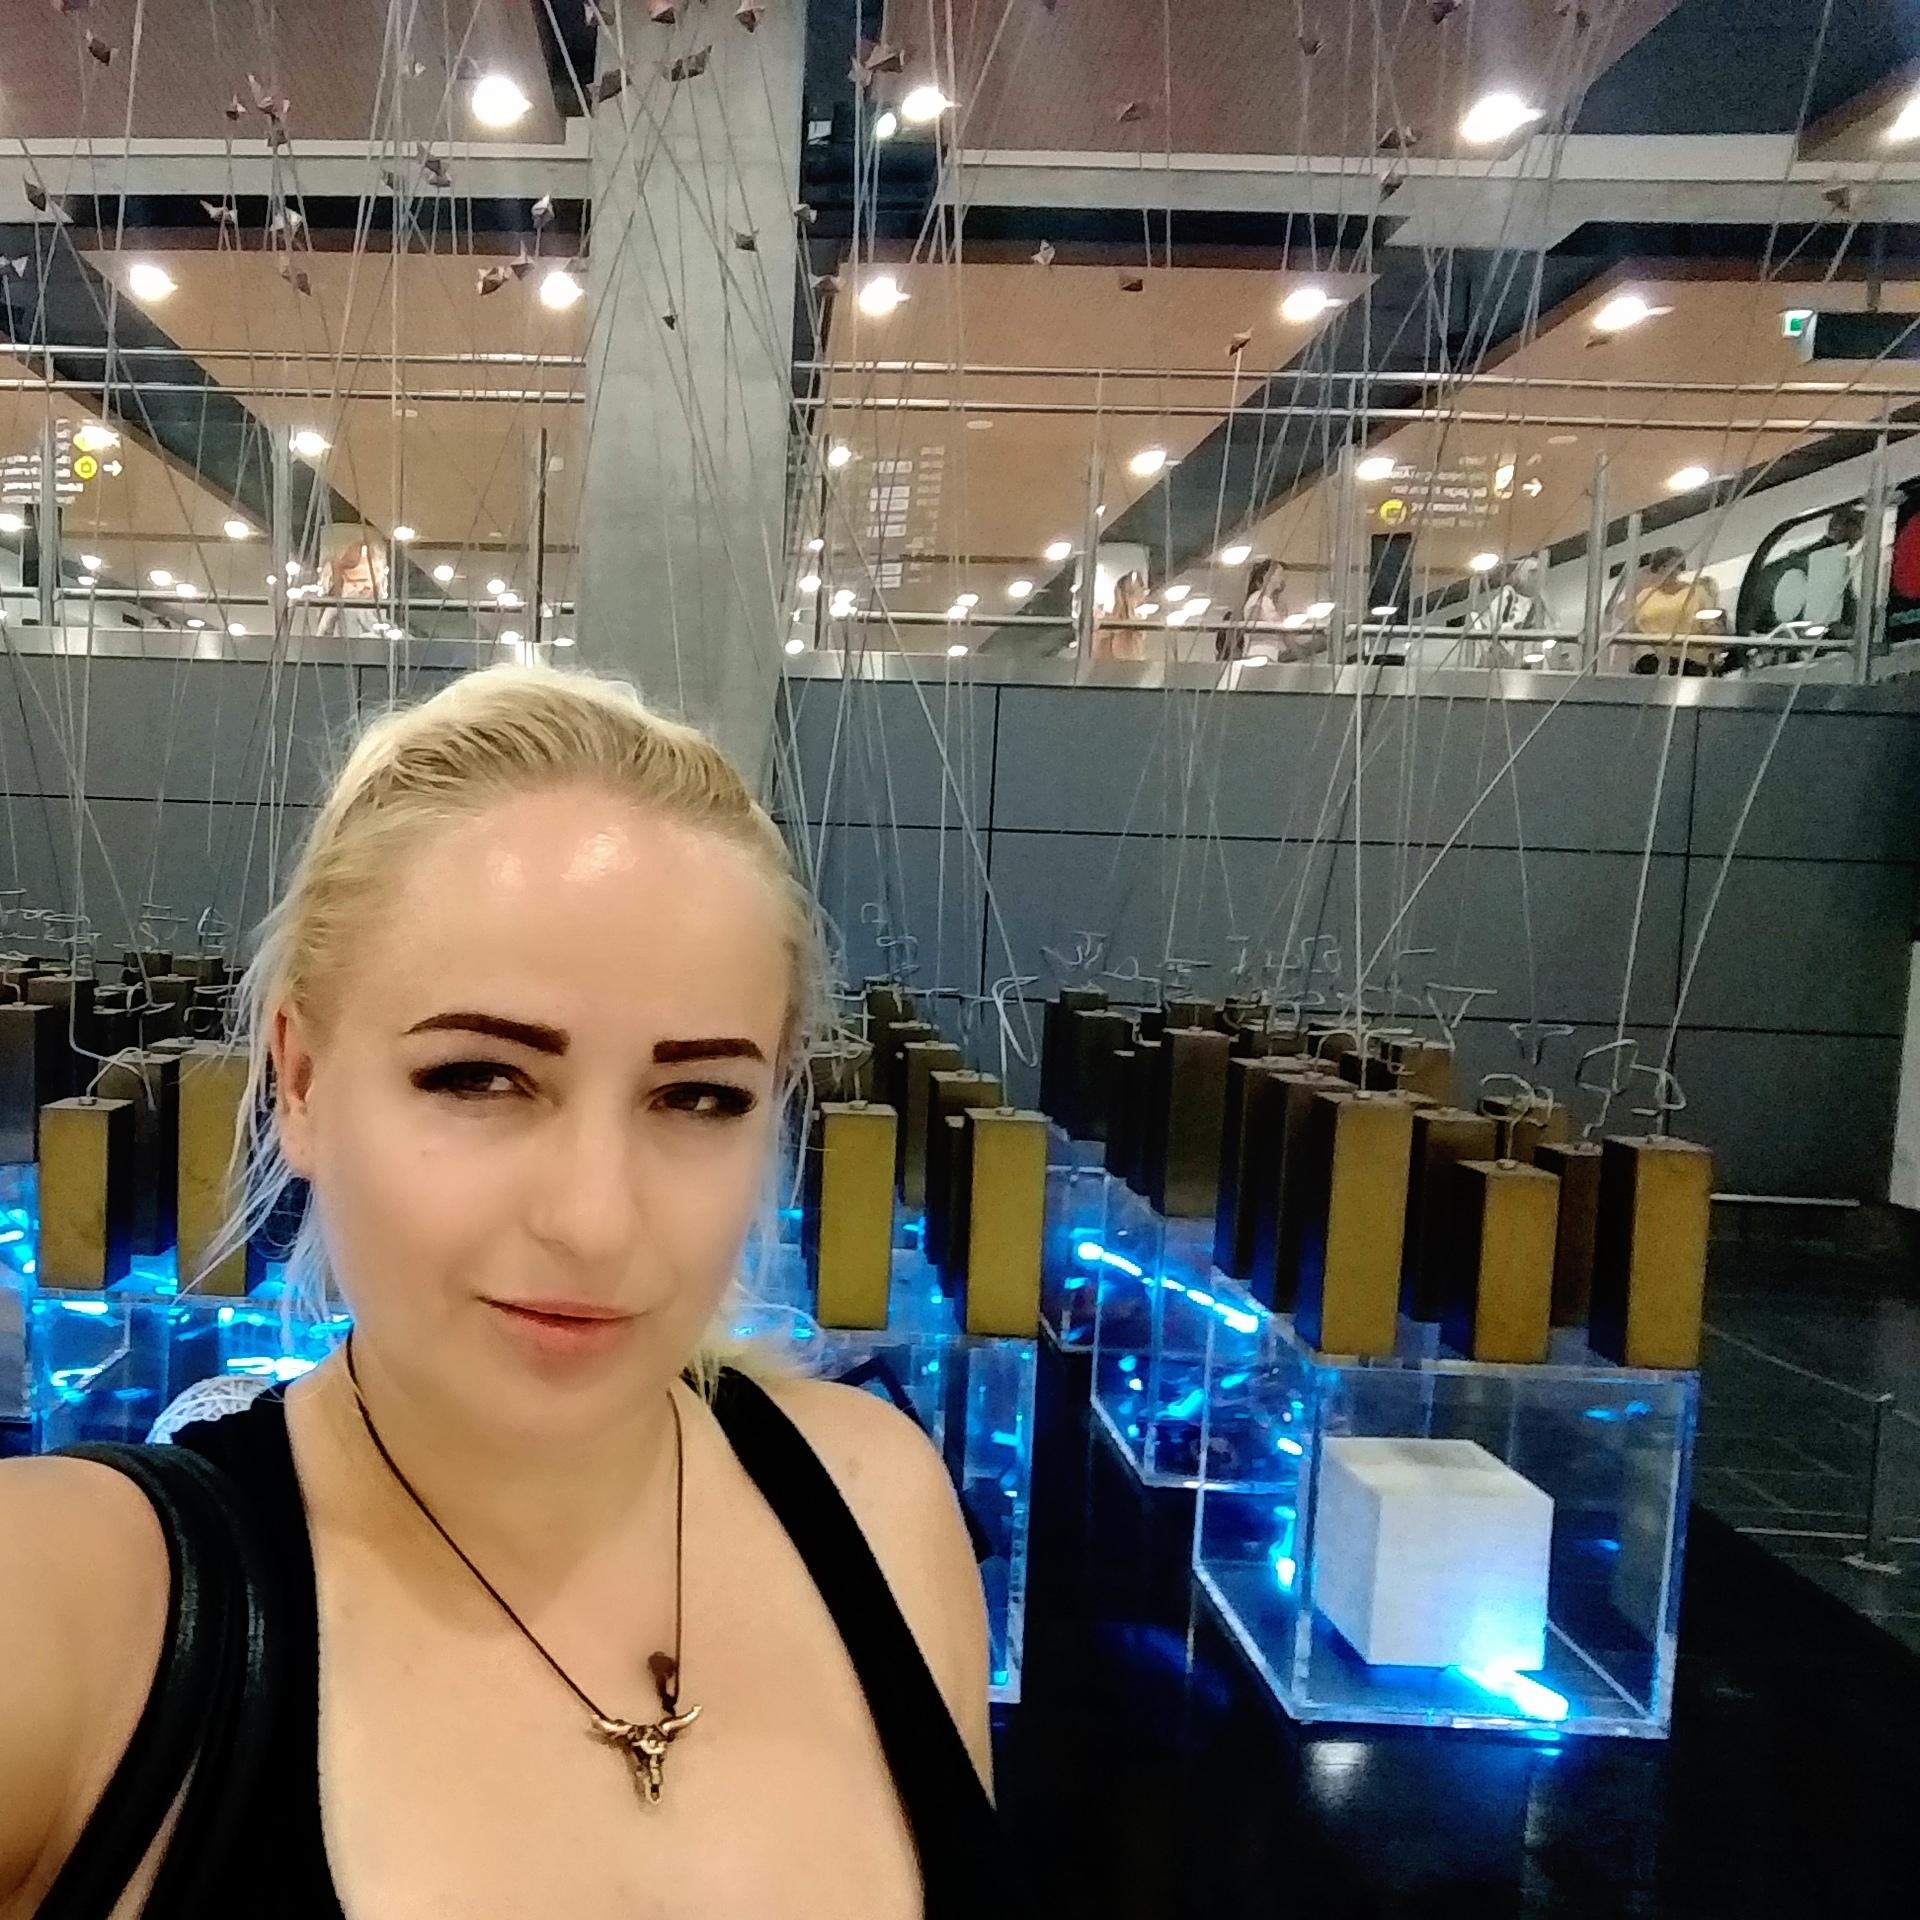 Елена Руденко (Валтея). Кипр. Айия-Напа (фото). BMeKy_jCDhc